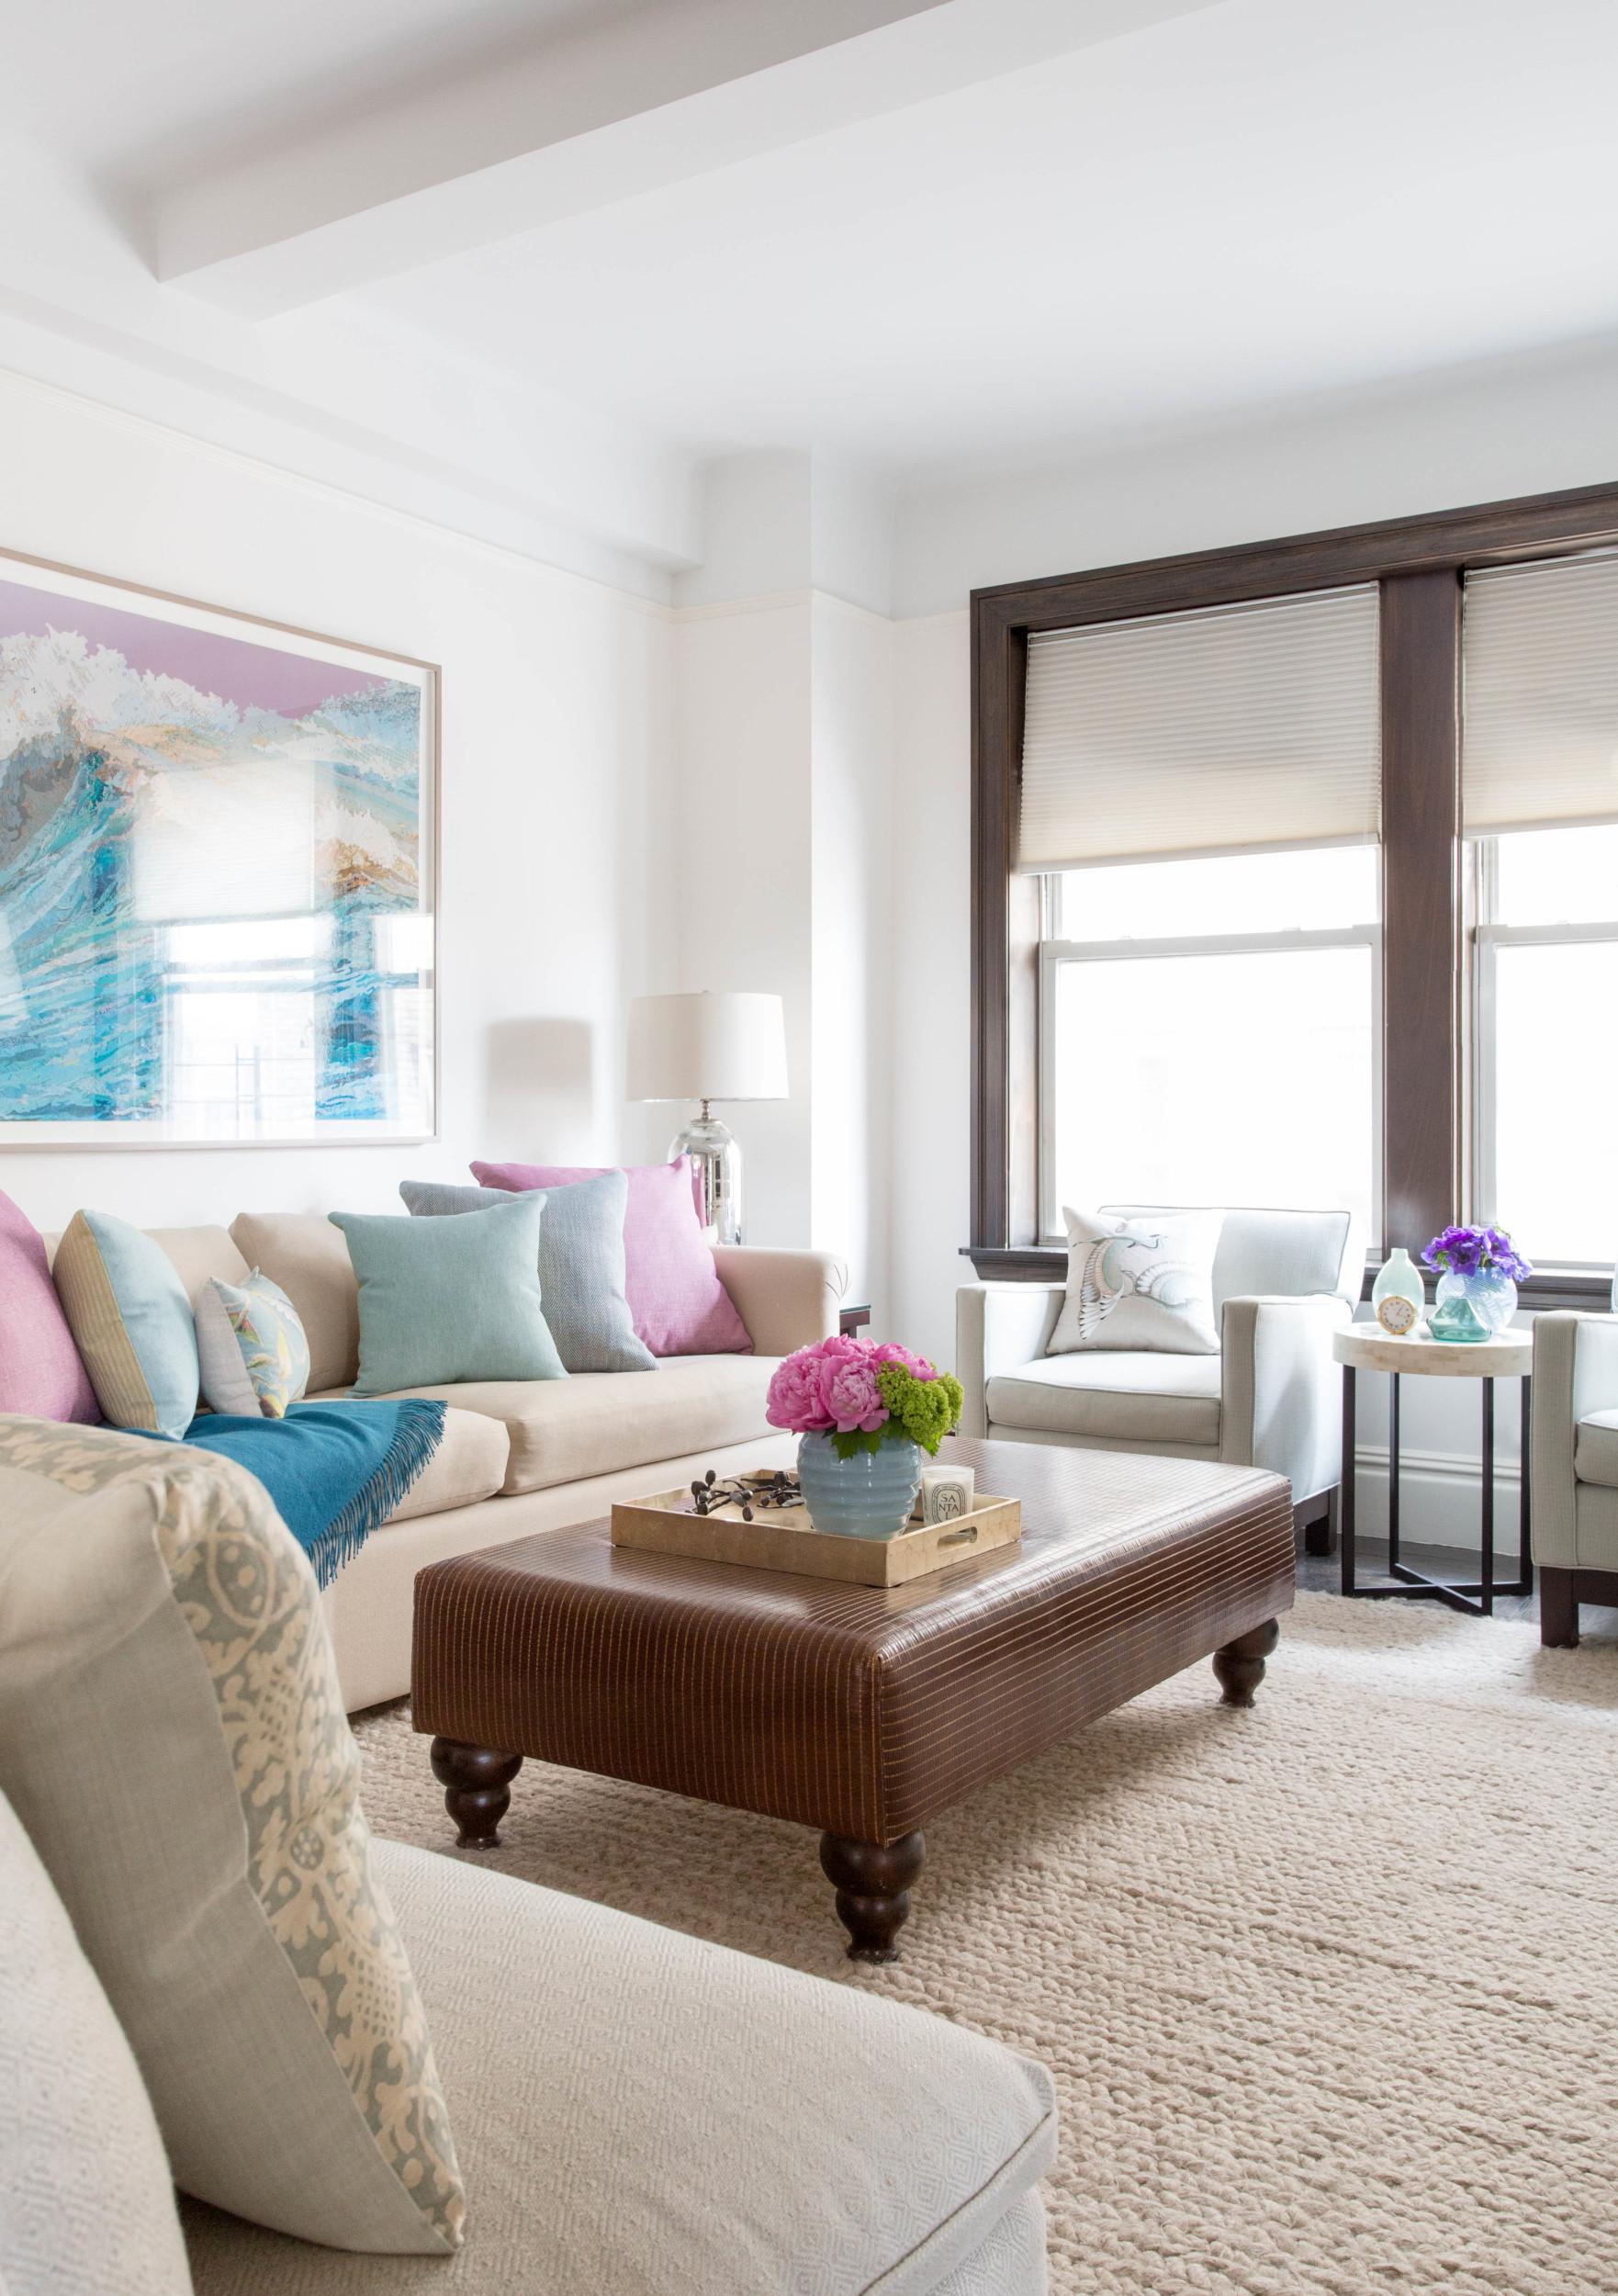 Best Interior Designers Connecticut Caroline Kopp.jpg